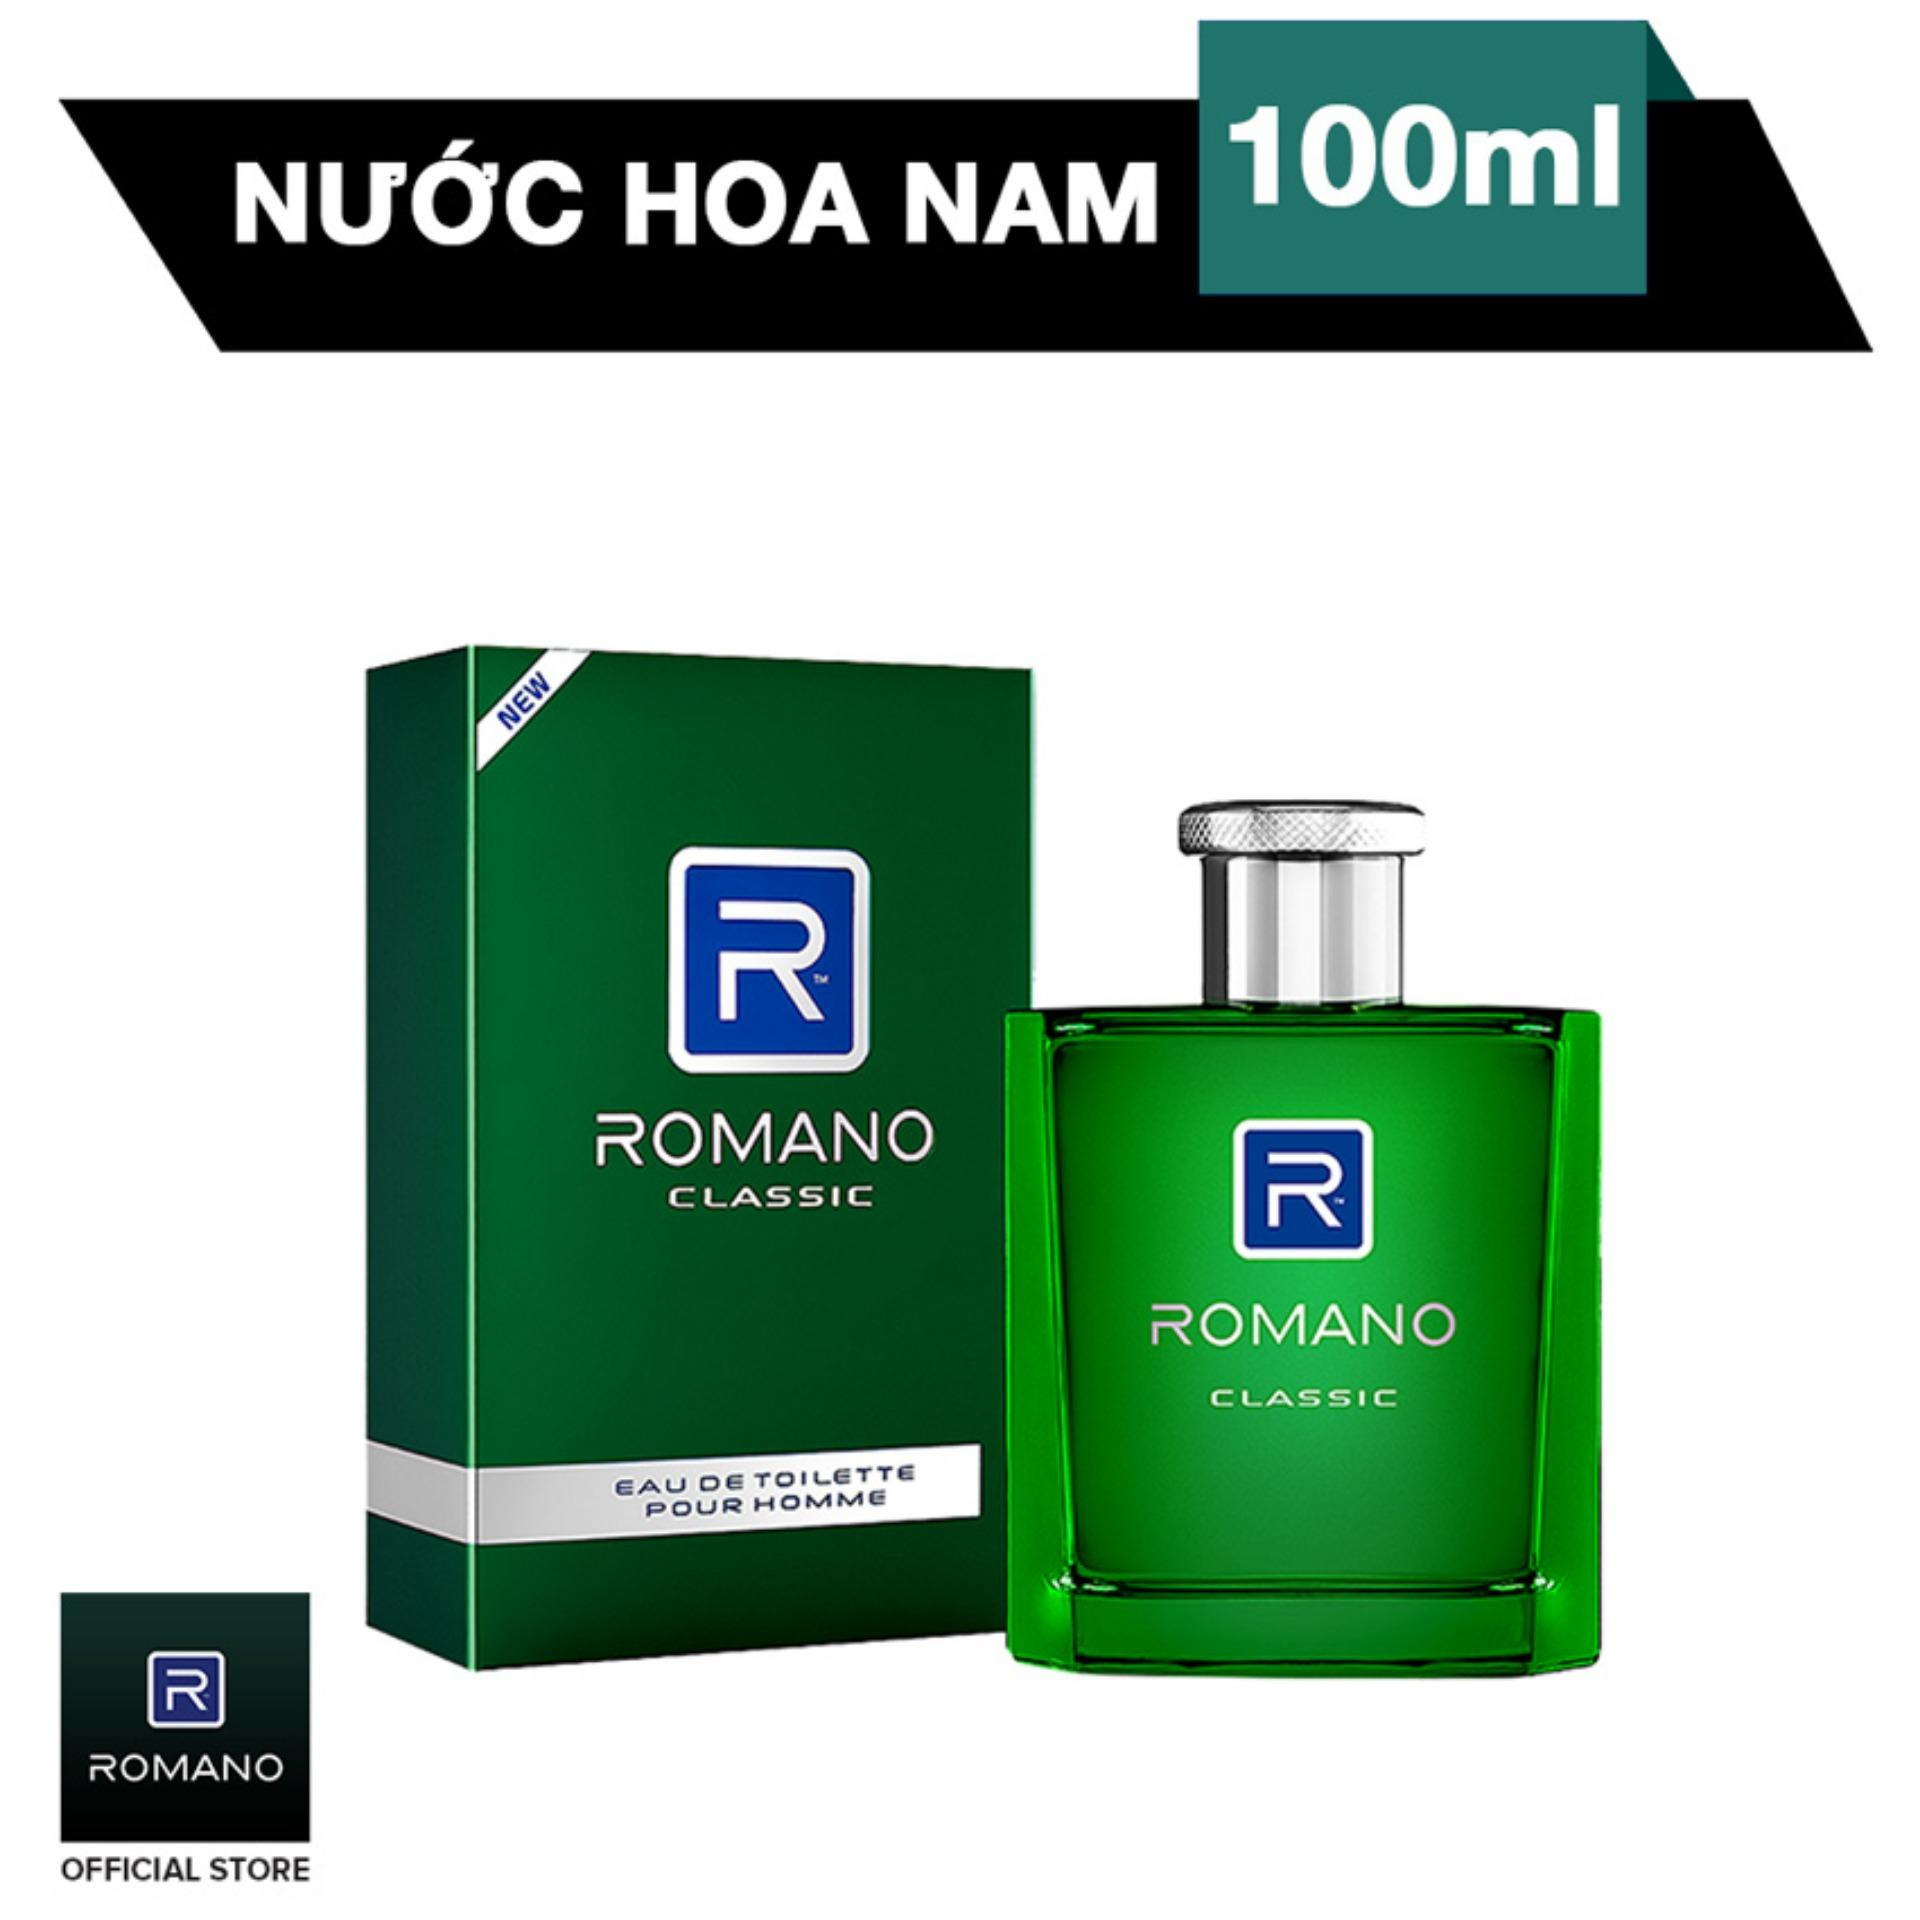 Romano nước hoa cao cấp Classic 100ml